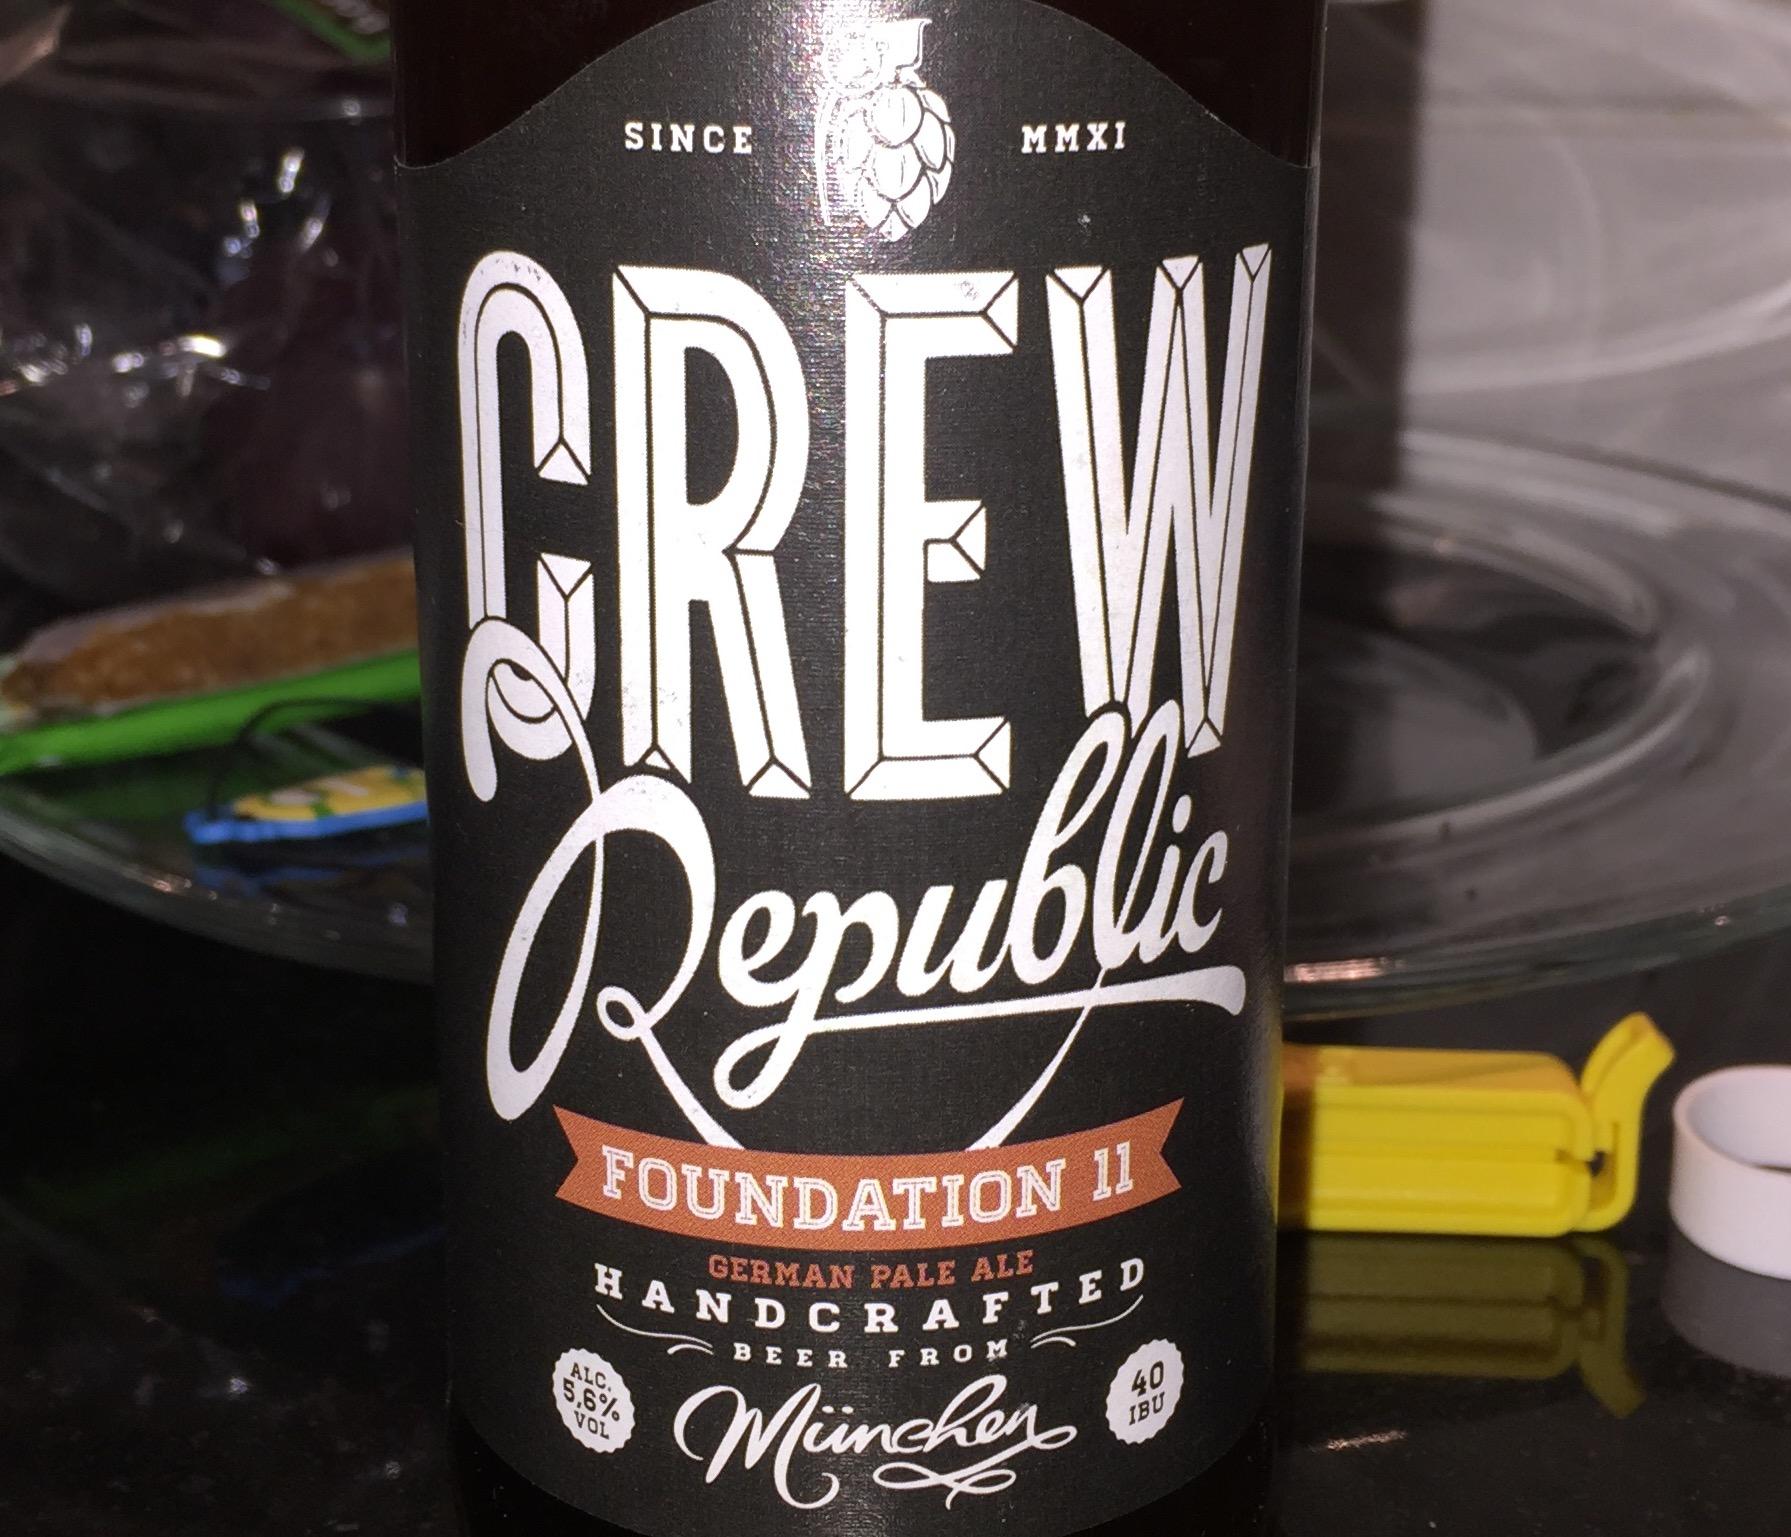 Crew Republic - Foundation II